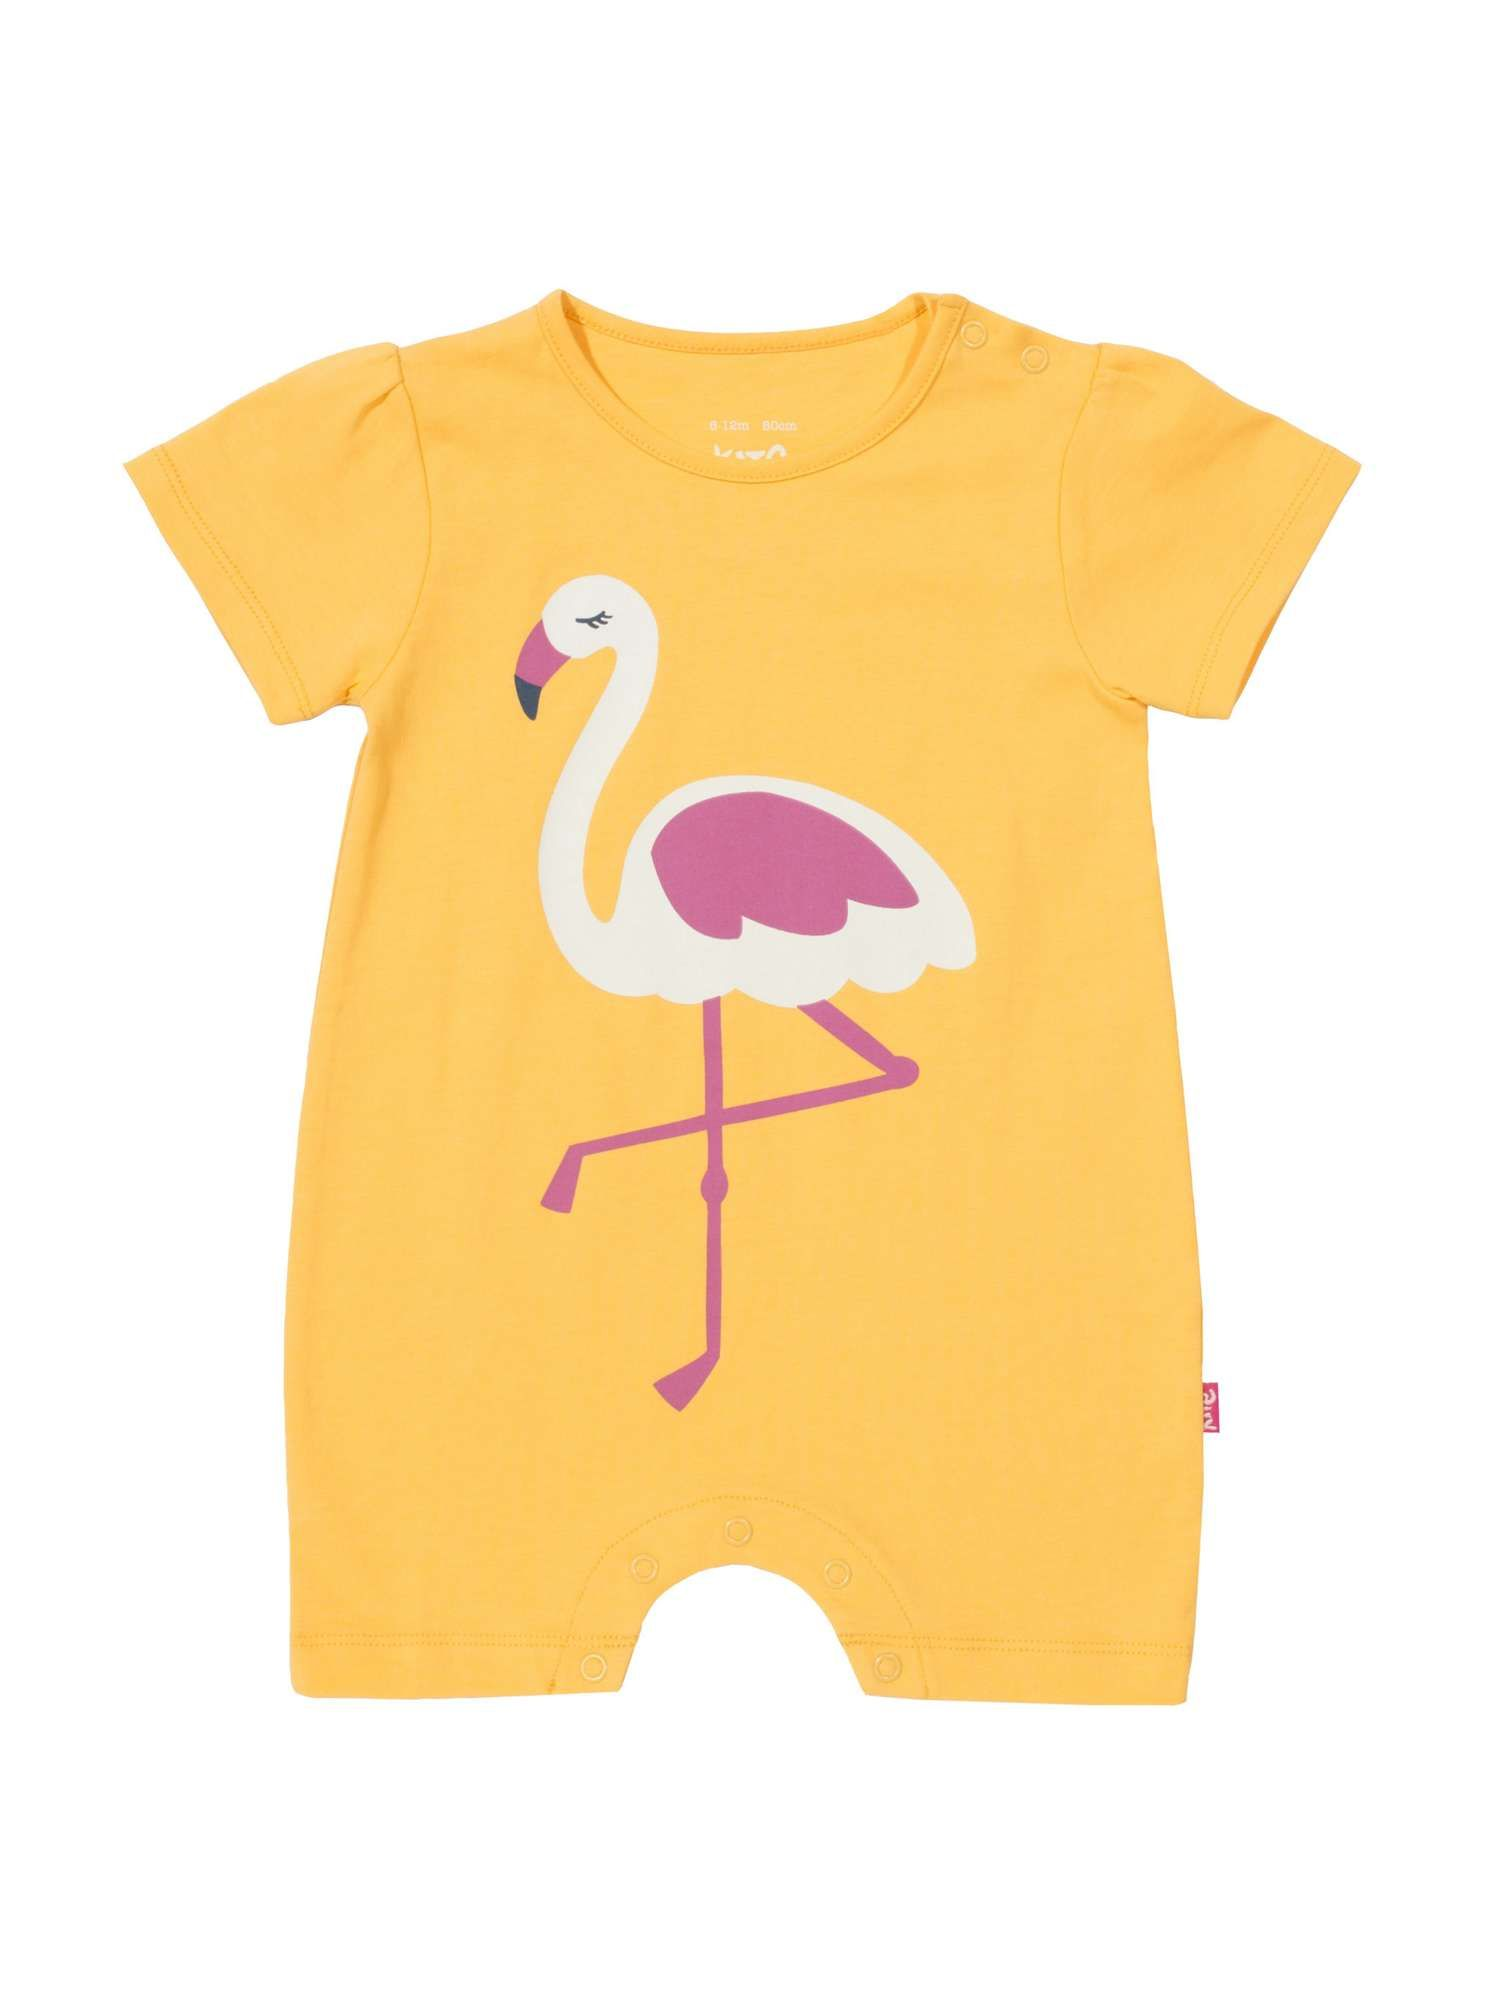 336ddeaad2c20 HouseofFraser - Kite Baby Girls Flamingo Romper |